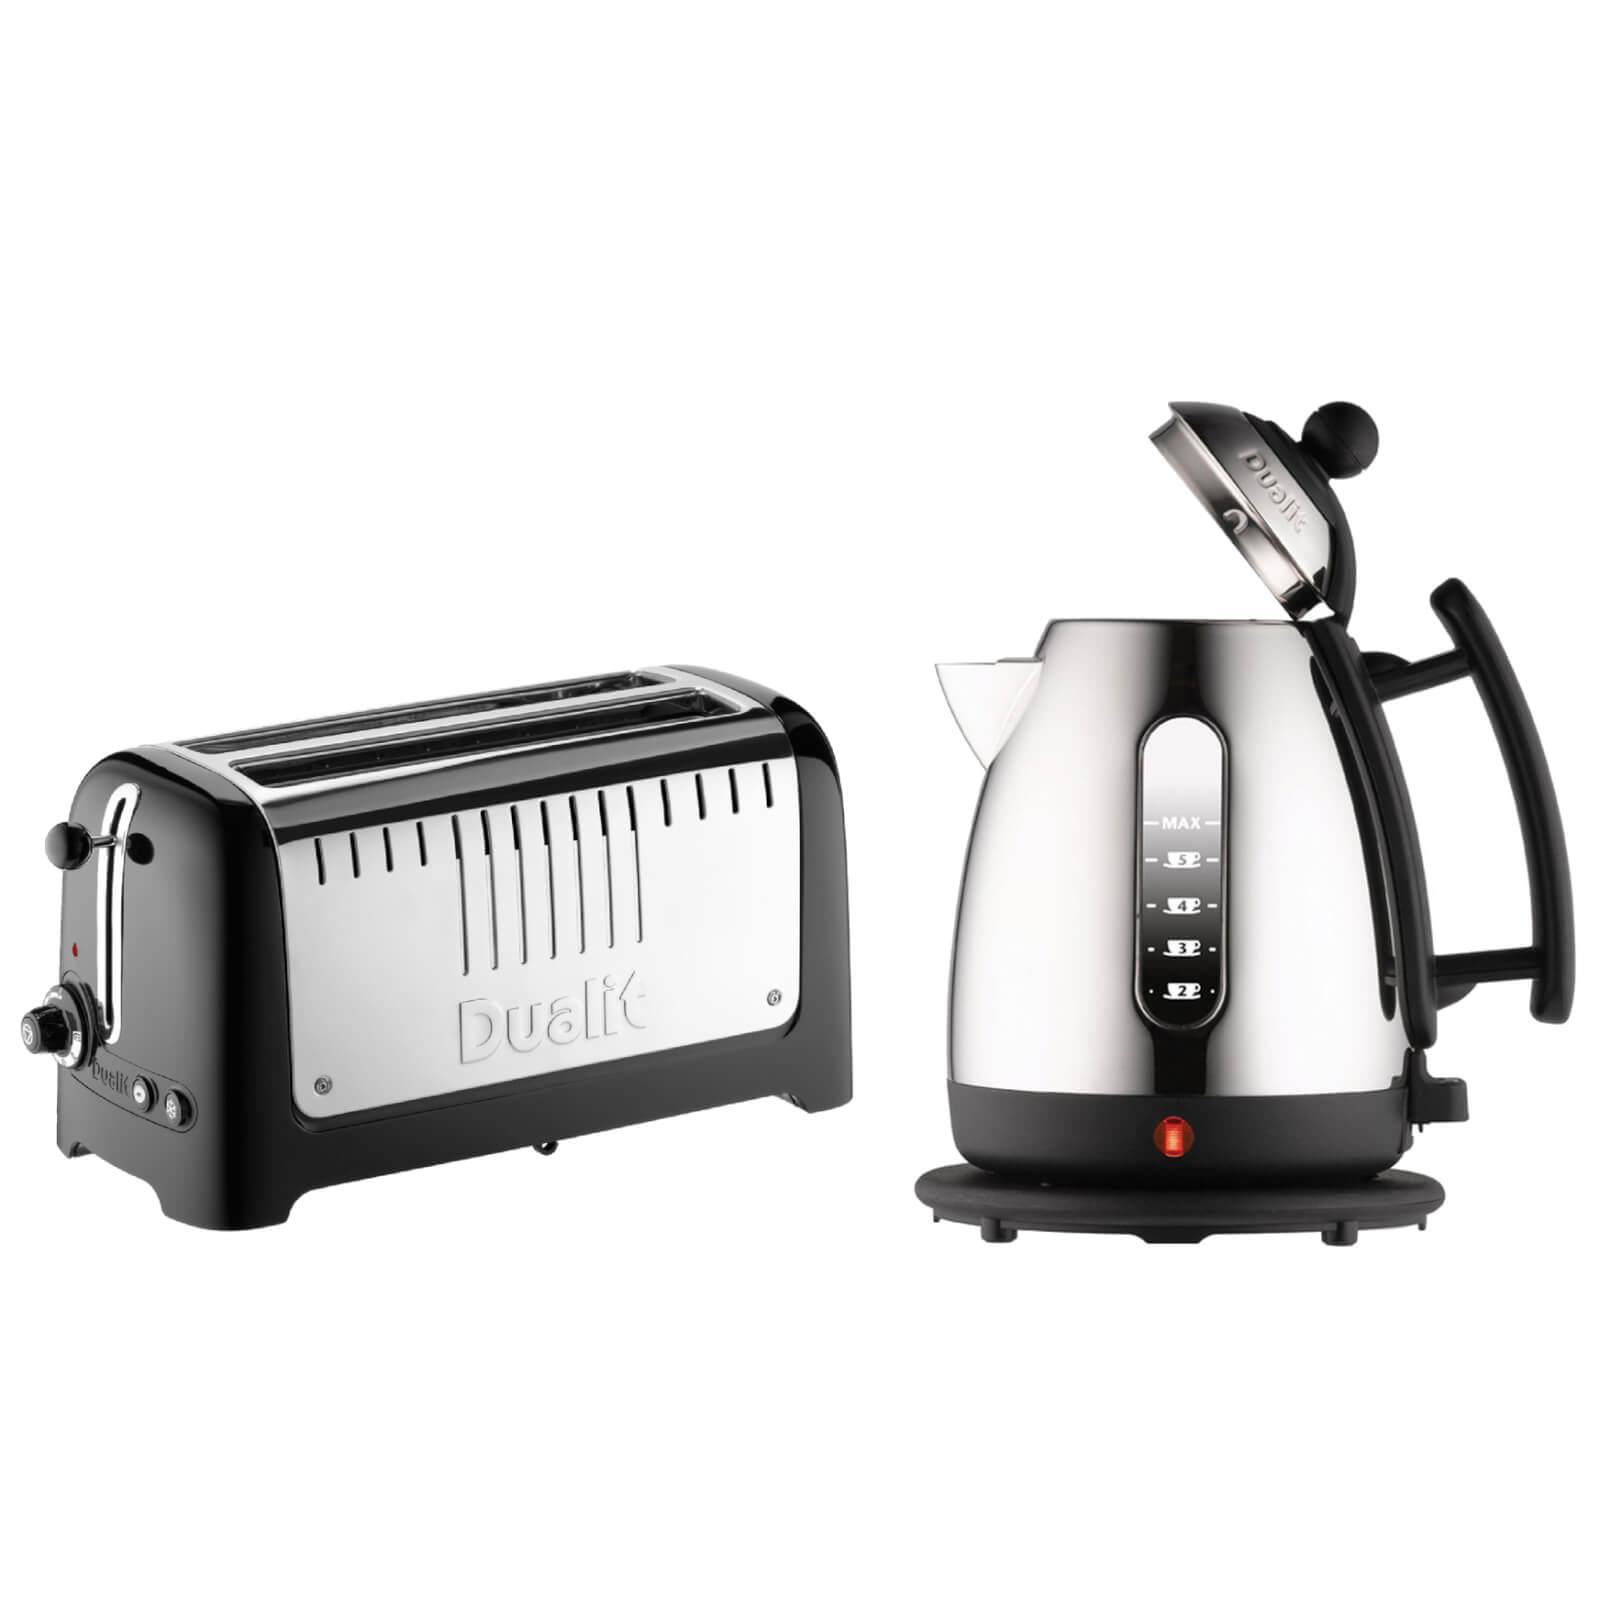 Dualit Jug Kettle and 4 Slice Long Slot Toaster Bundle - Black